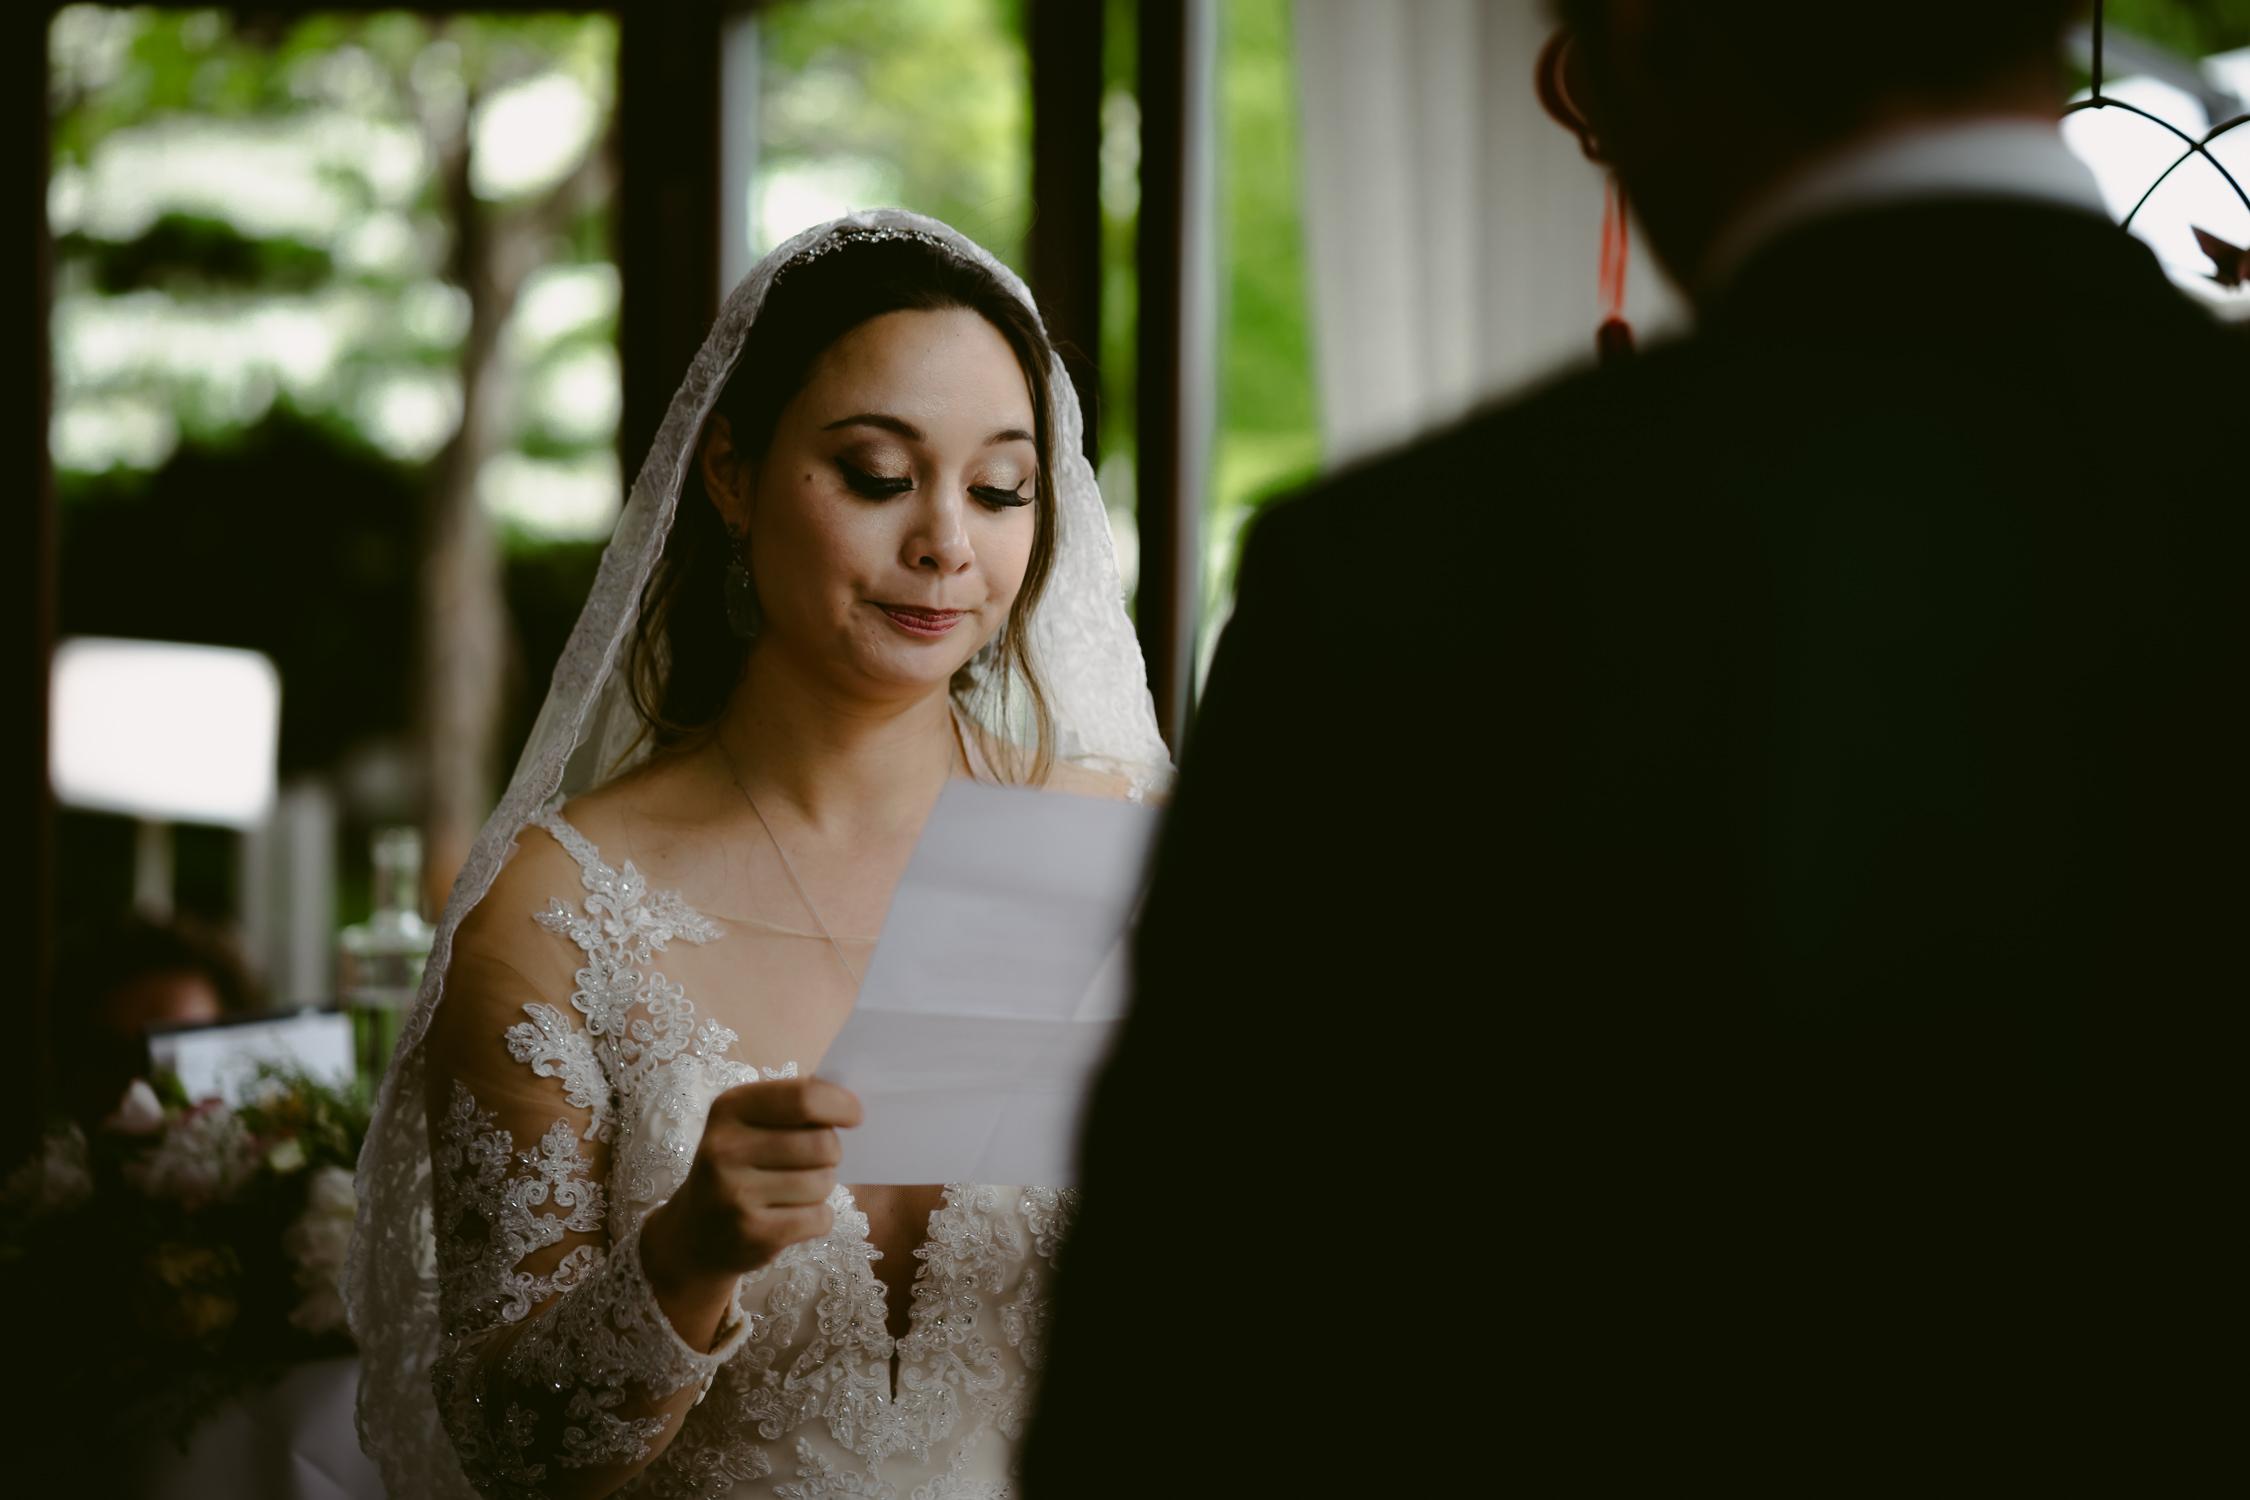 bruidsfotografie-amsterdam-utrecht-trouwfotograaf-mark-hadden-wedding-photography-Robin & Guus-205.jpg